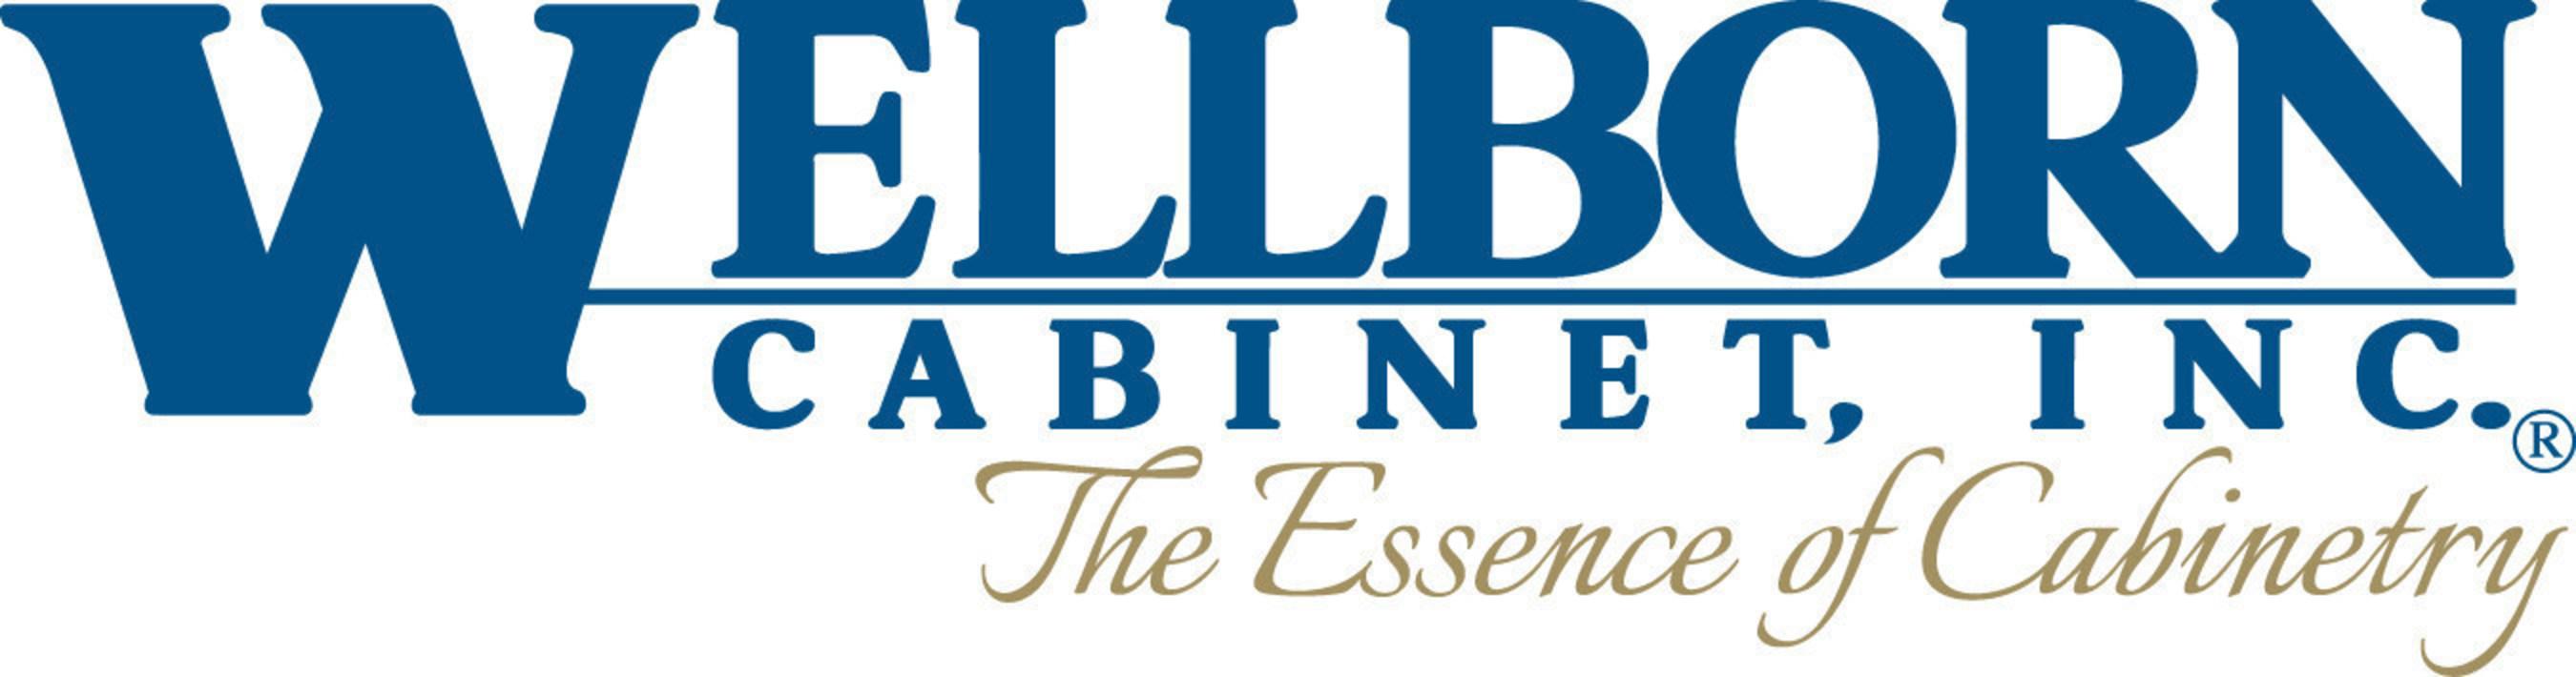 Wellborn Cabinet, Inc. Logo